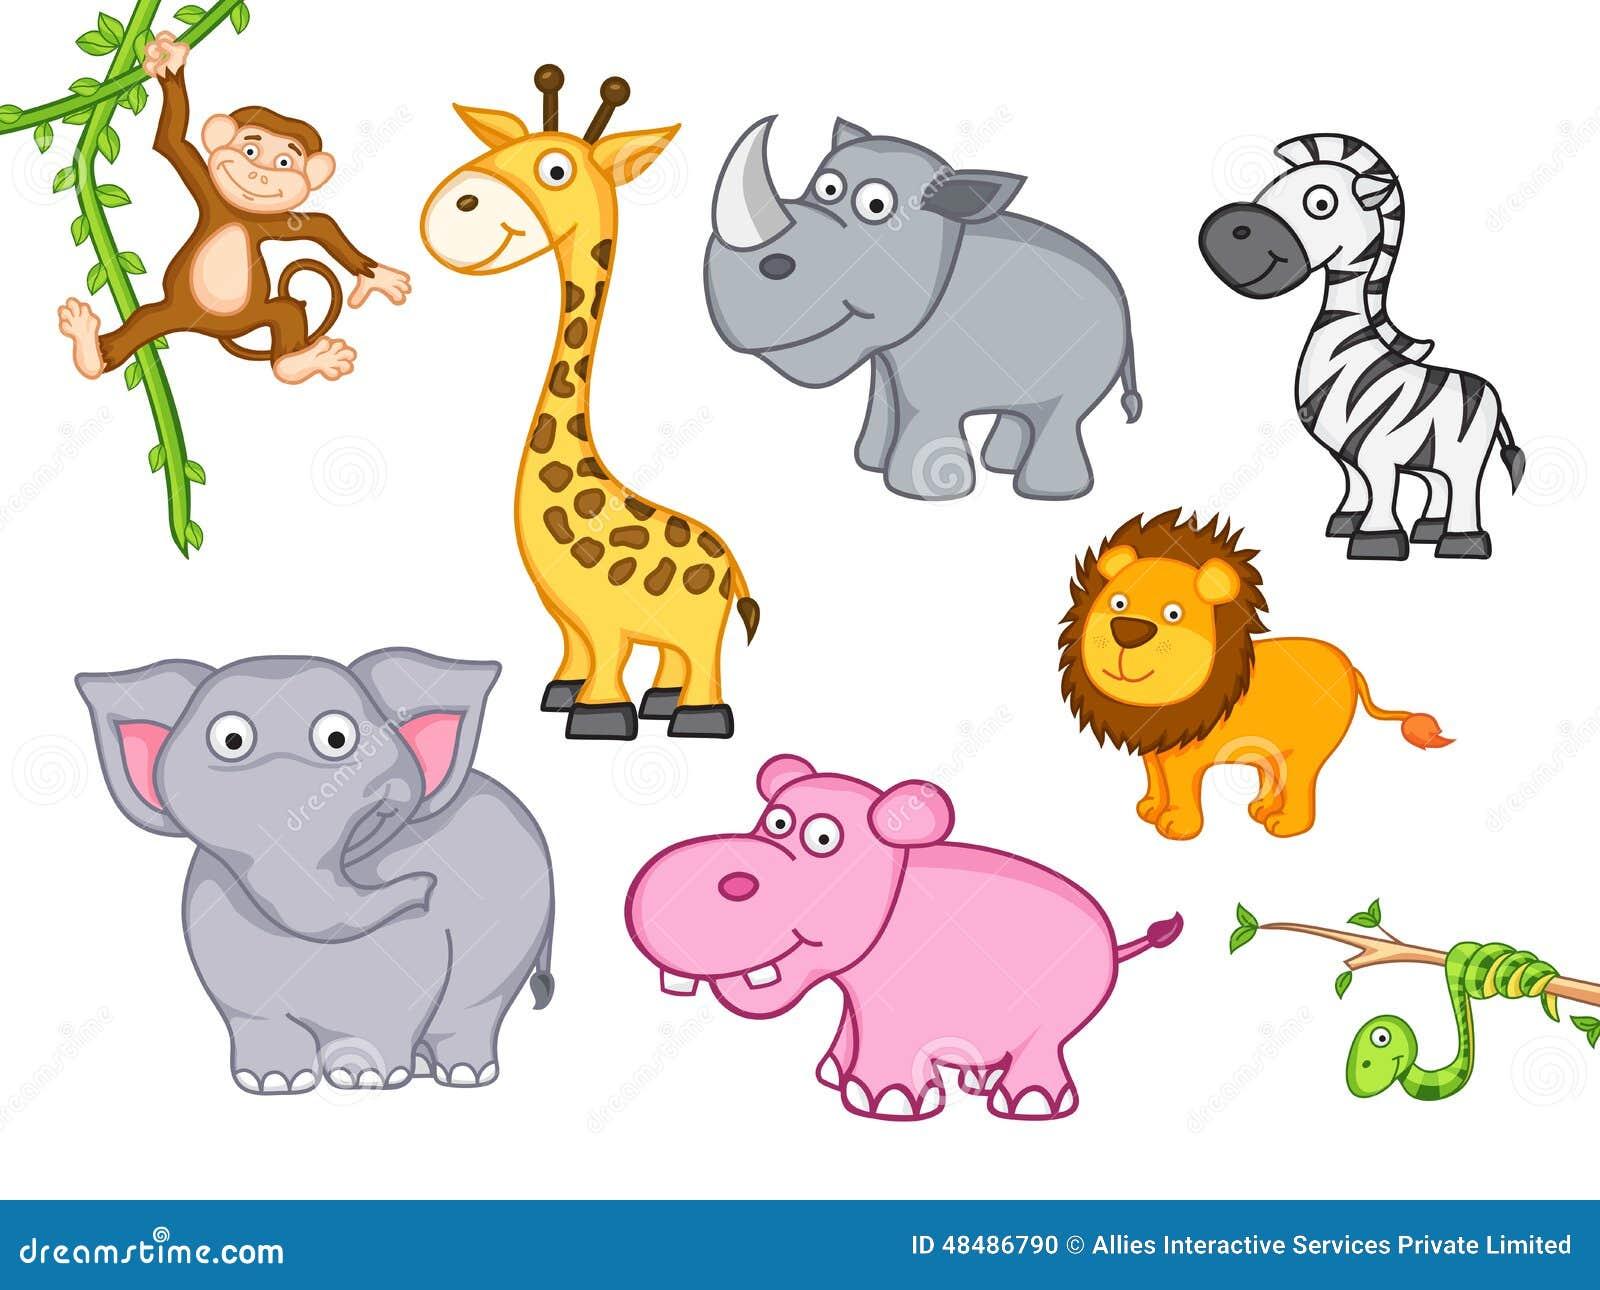 Cute Funny Cartoon Animal Stock Illustration